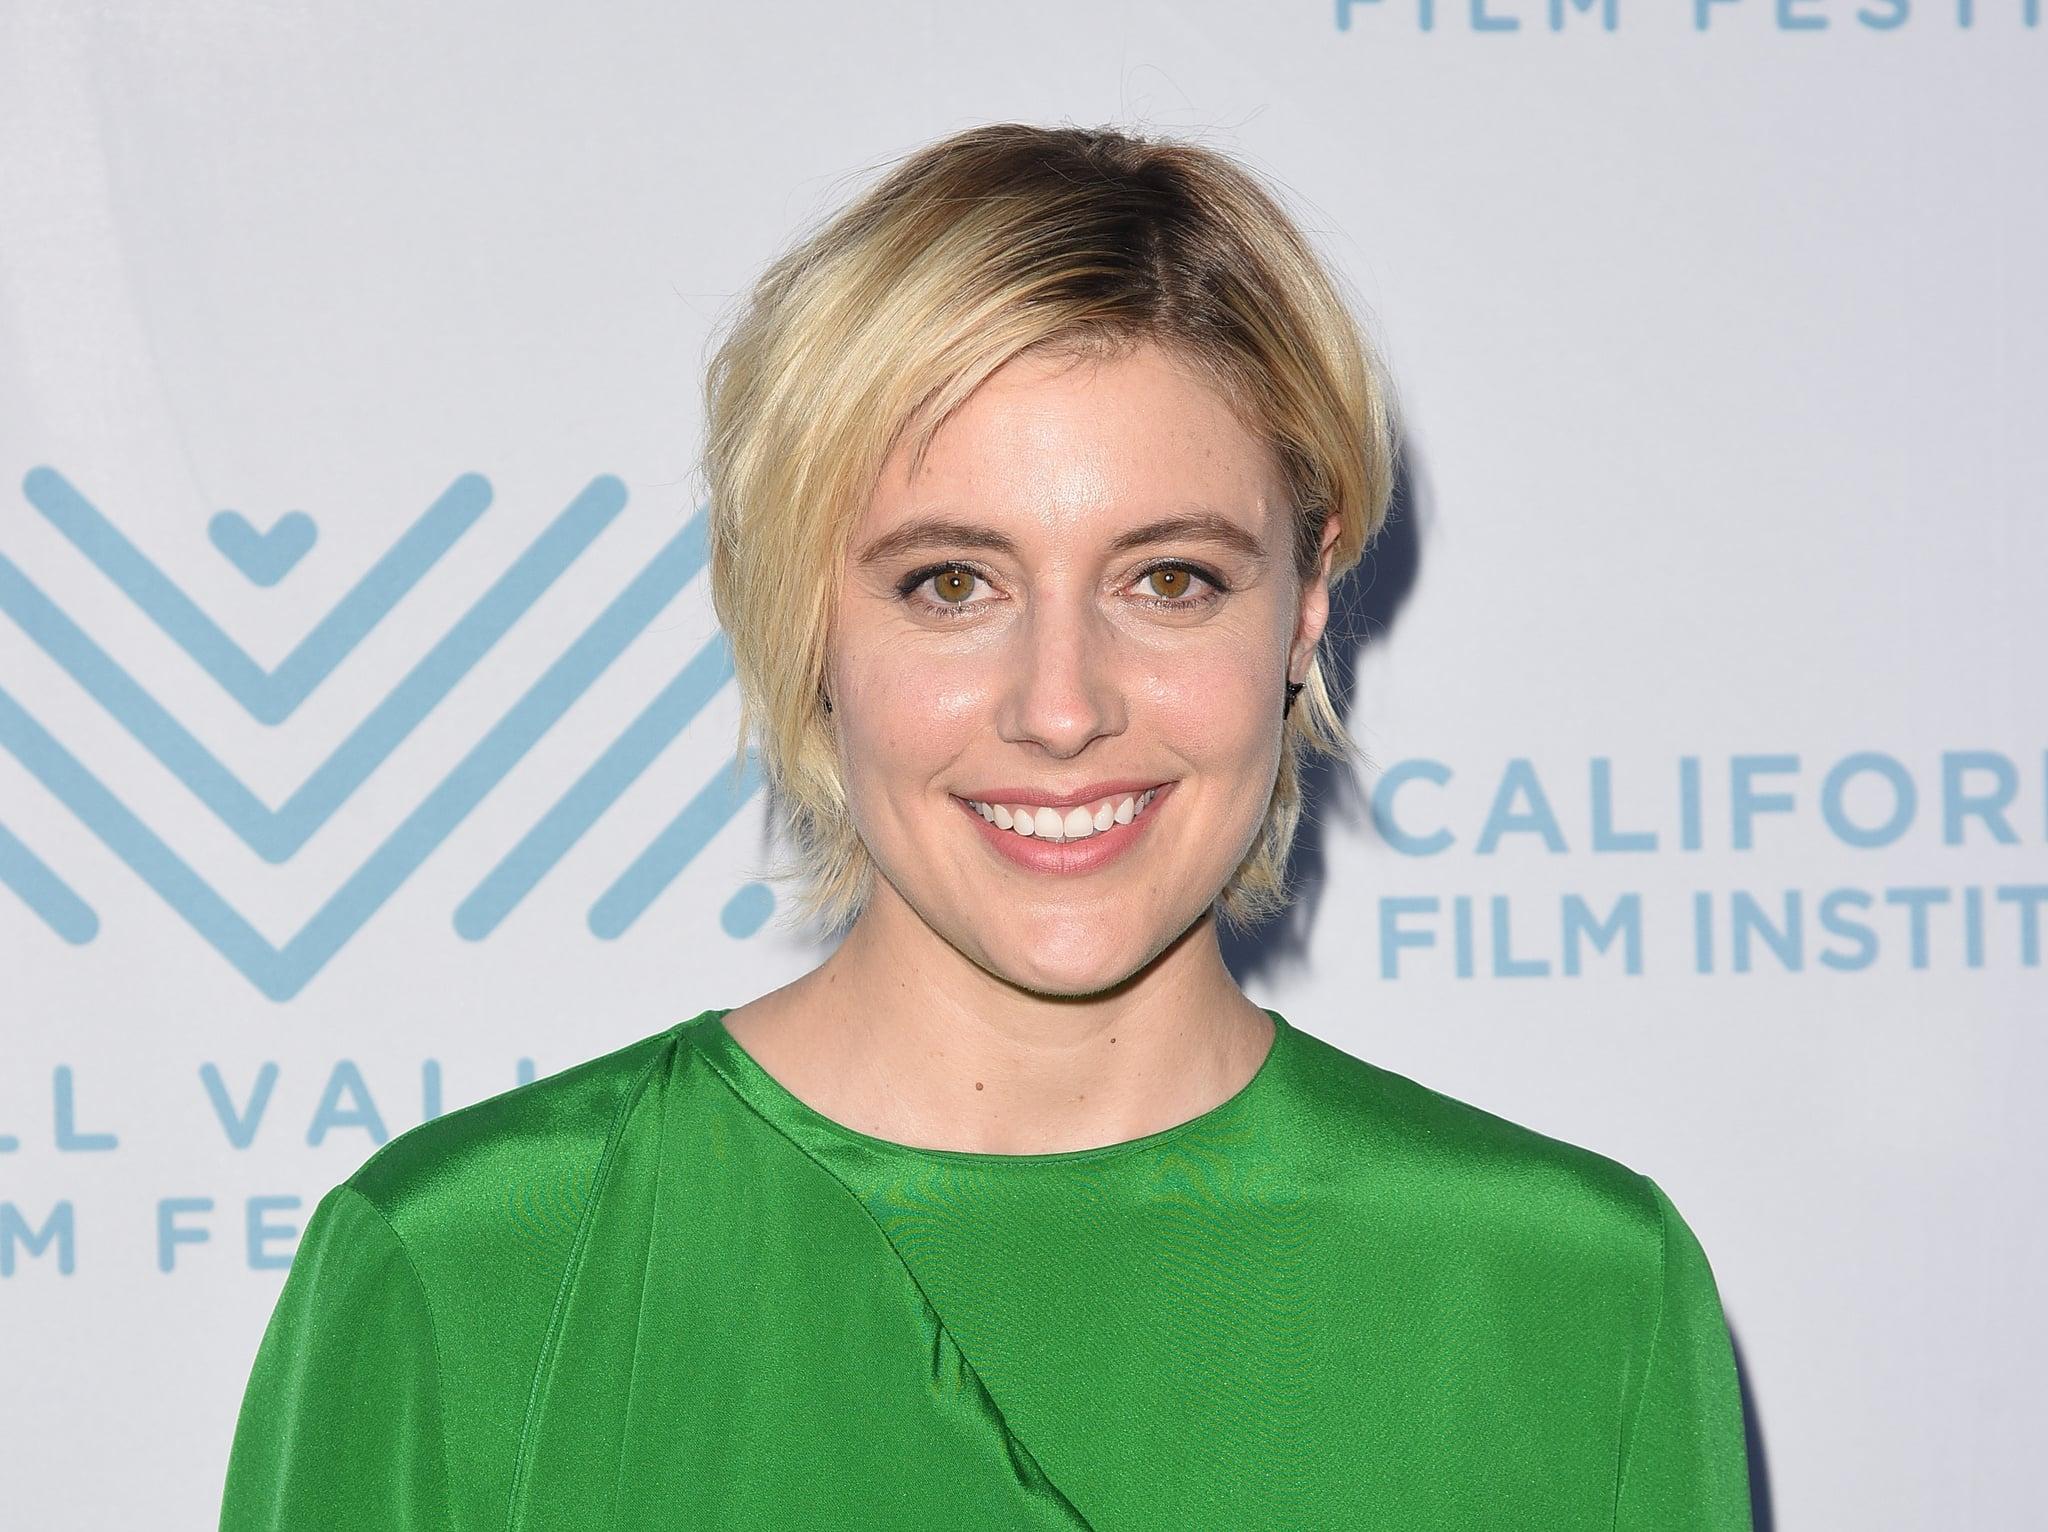 female directing nominees Greta Gerwig lady bird